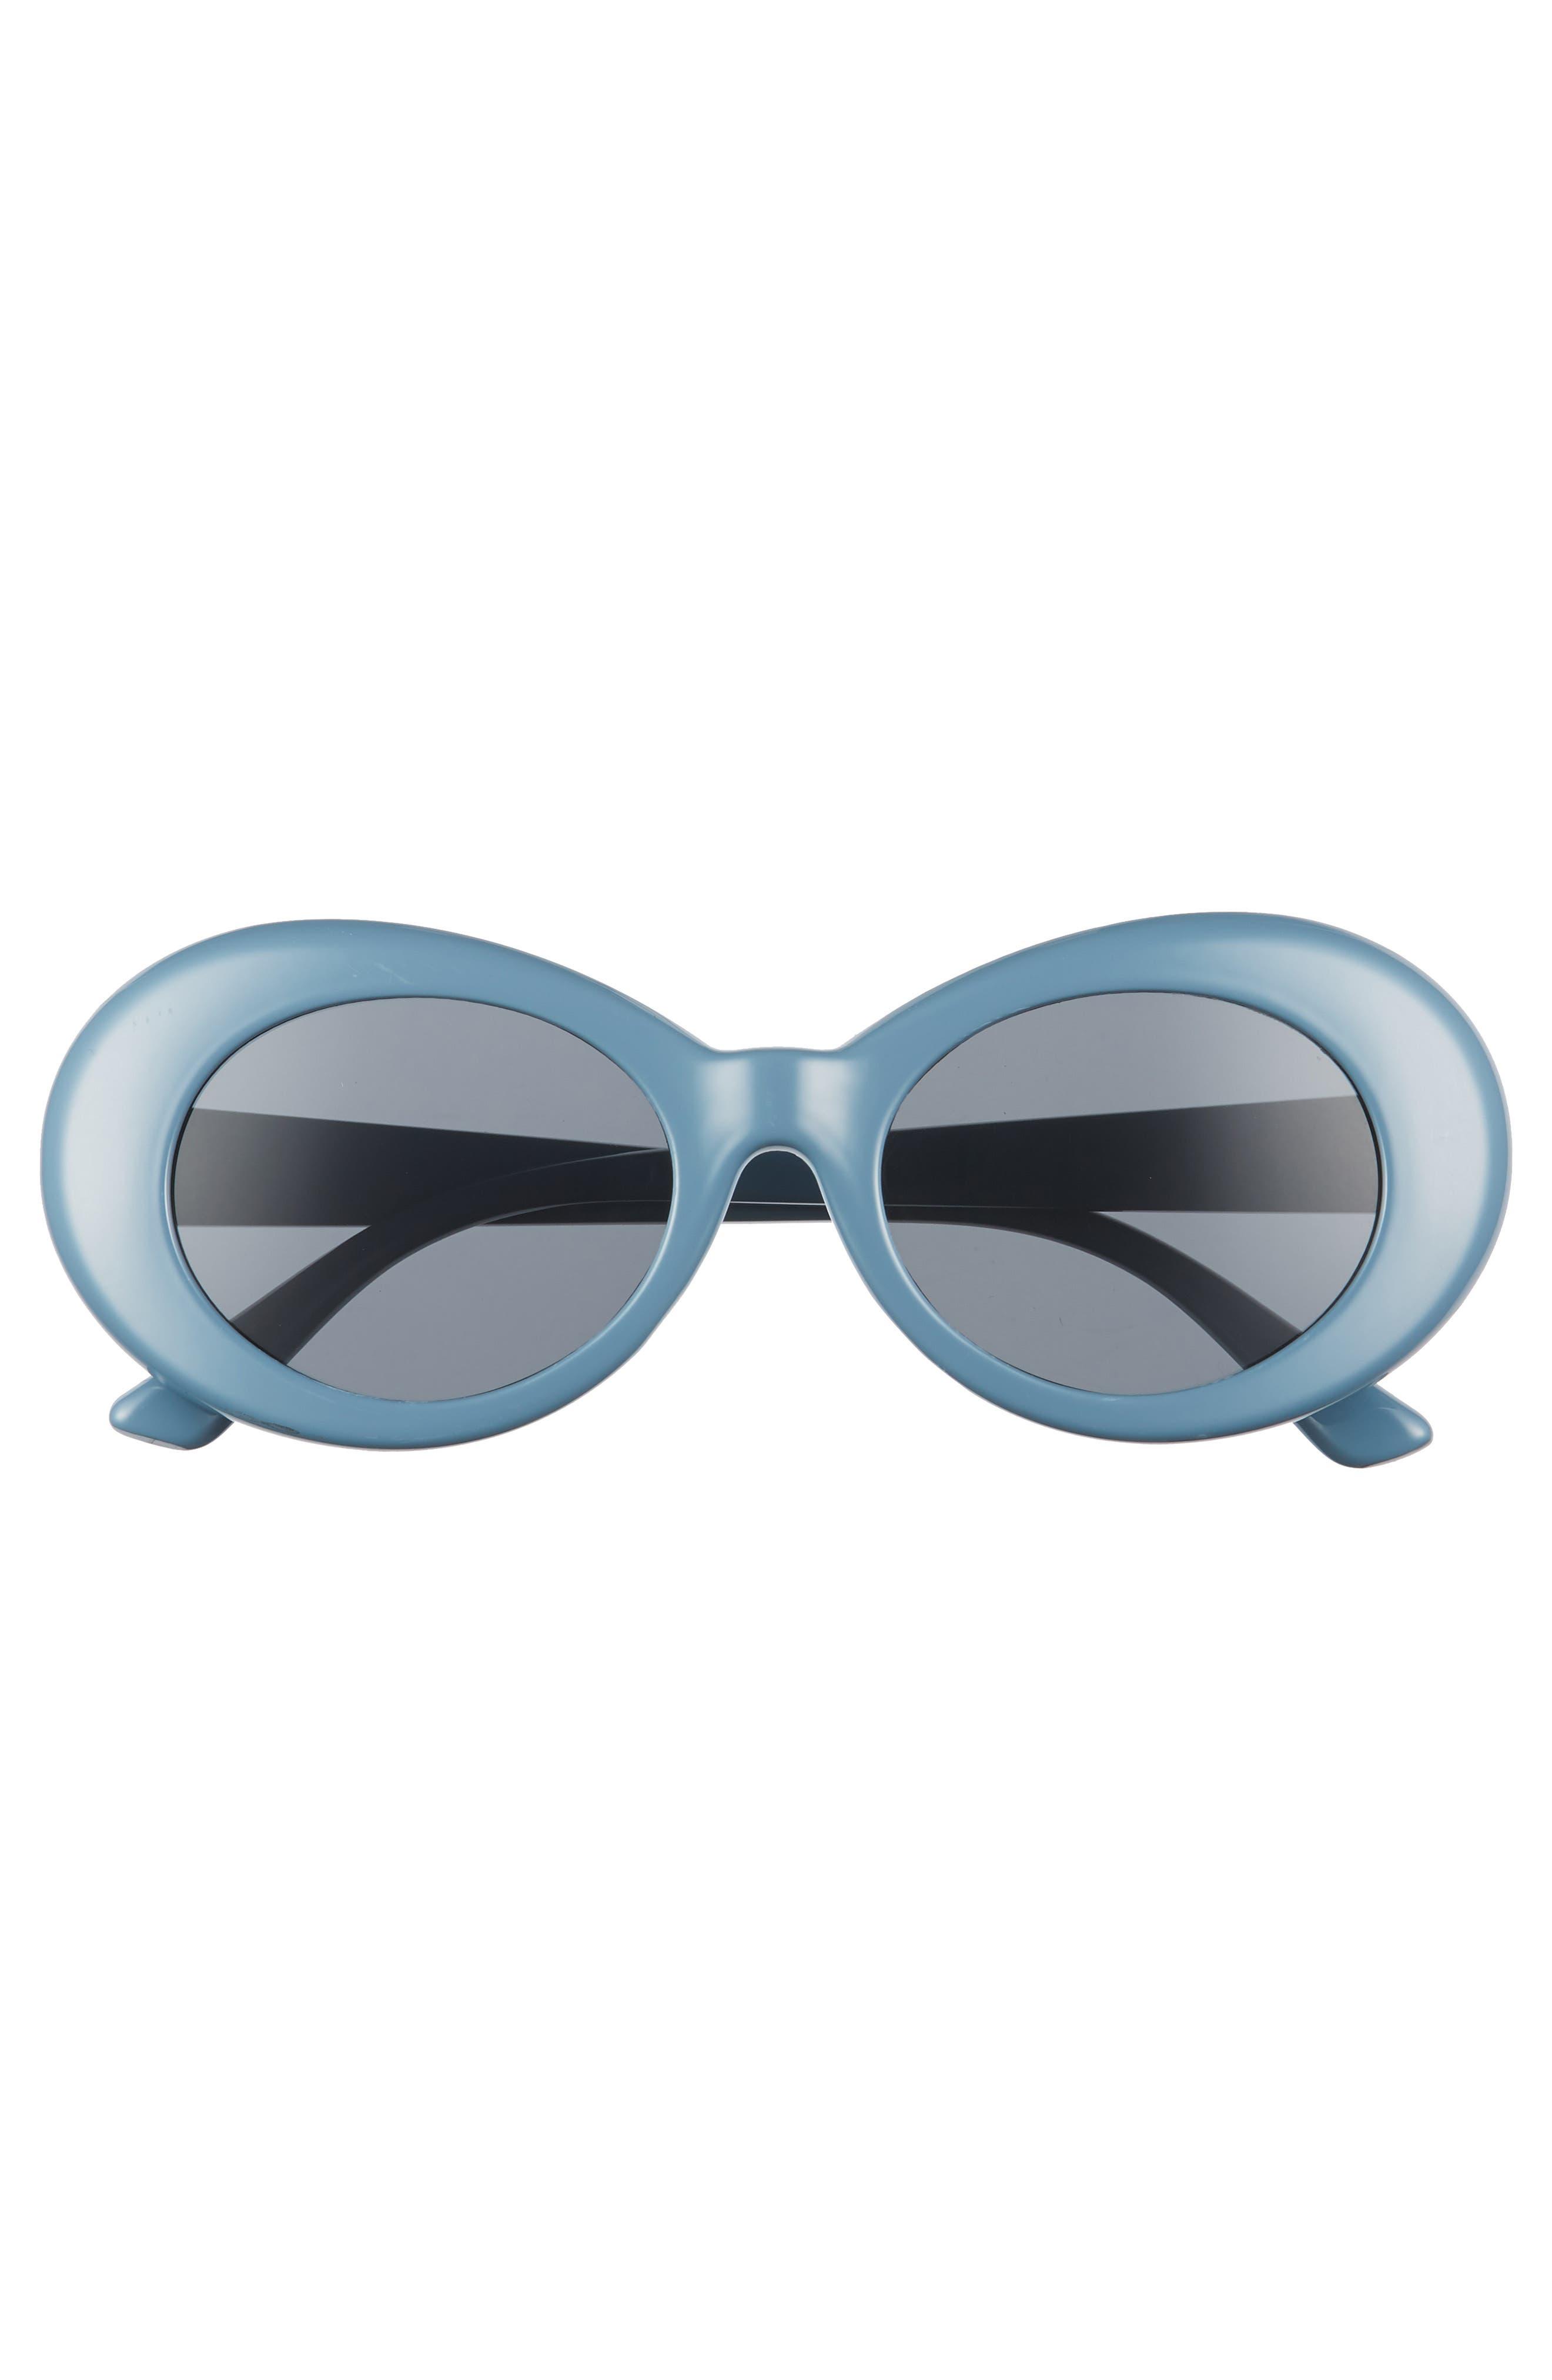 50mm Round Sunglasses,                             Alternate thumbnail 3, color,                             MARINE BLUE